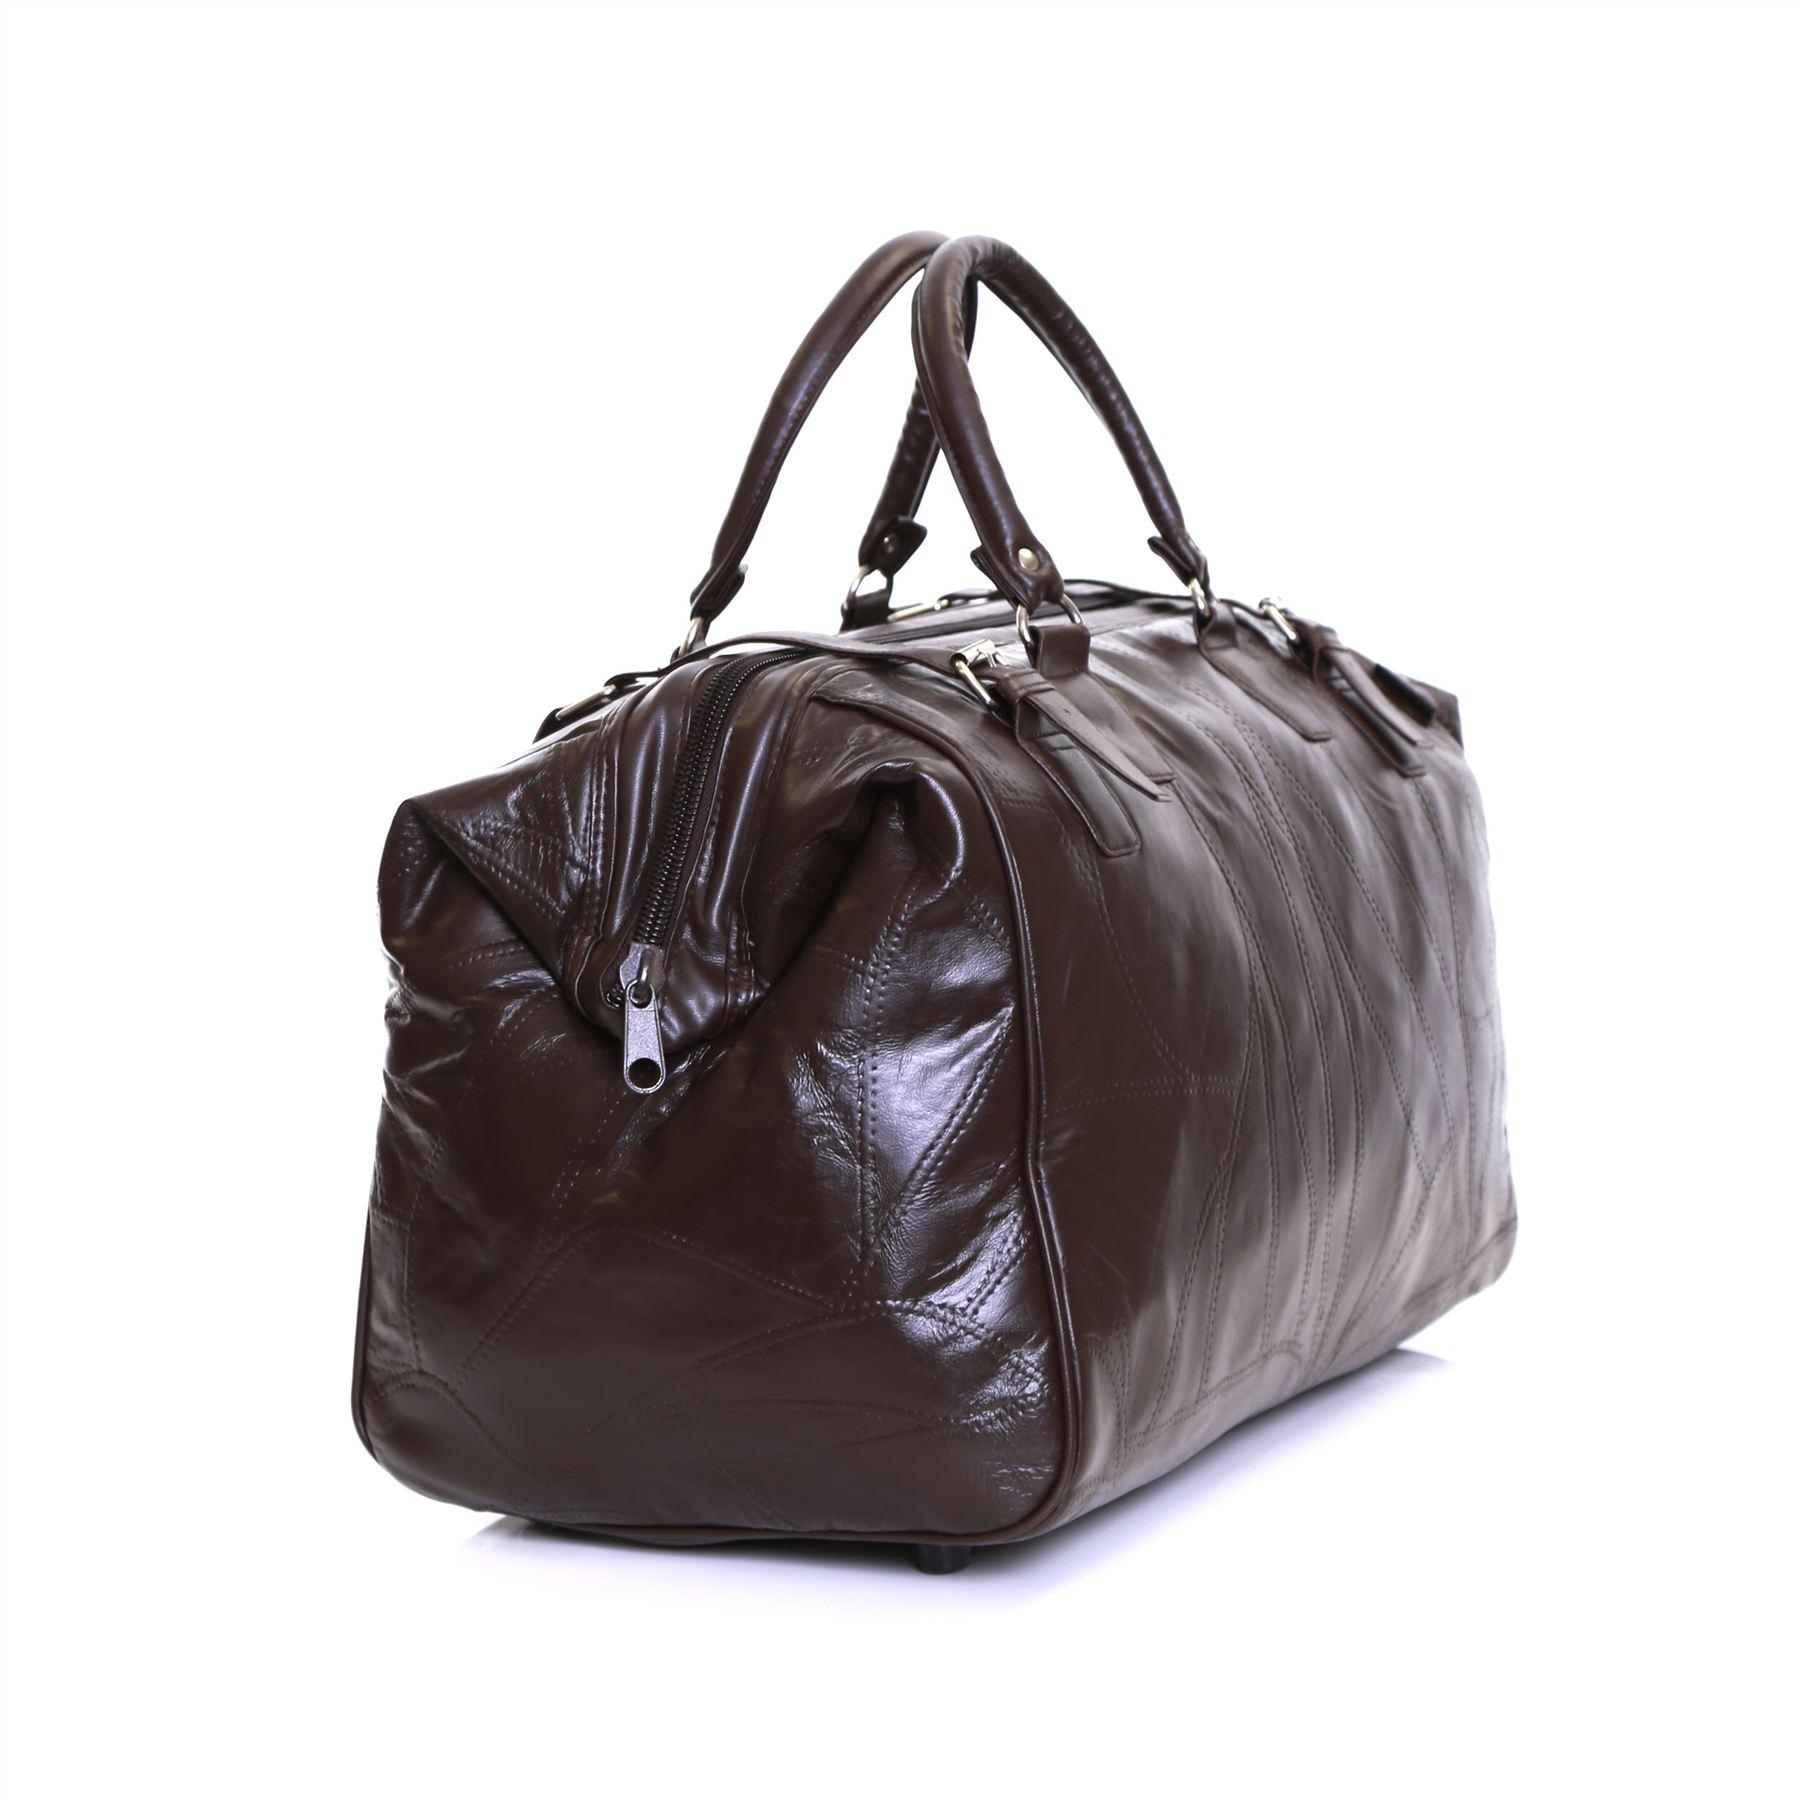 nouveau sac de sport cuir v ritable bagage en cabine. Black Bedroom Furniture Sets. Home Design Ideas